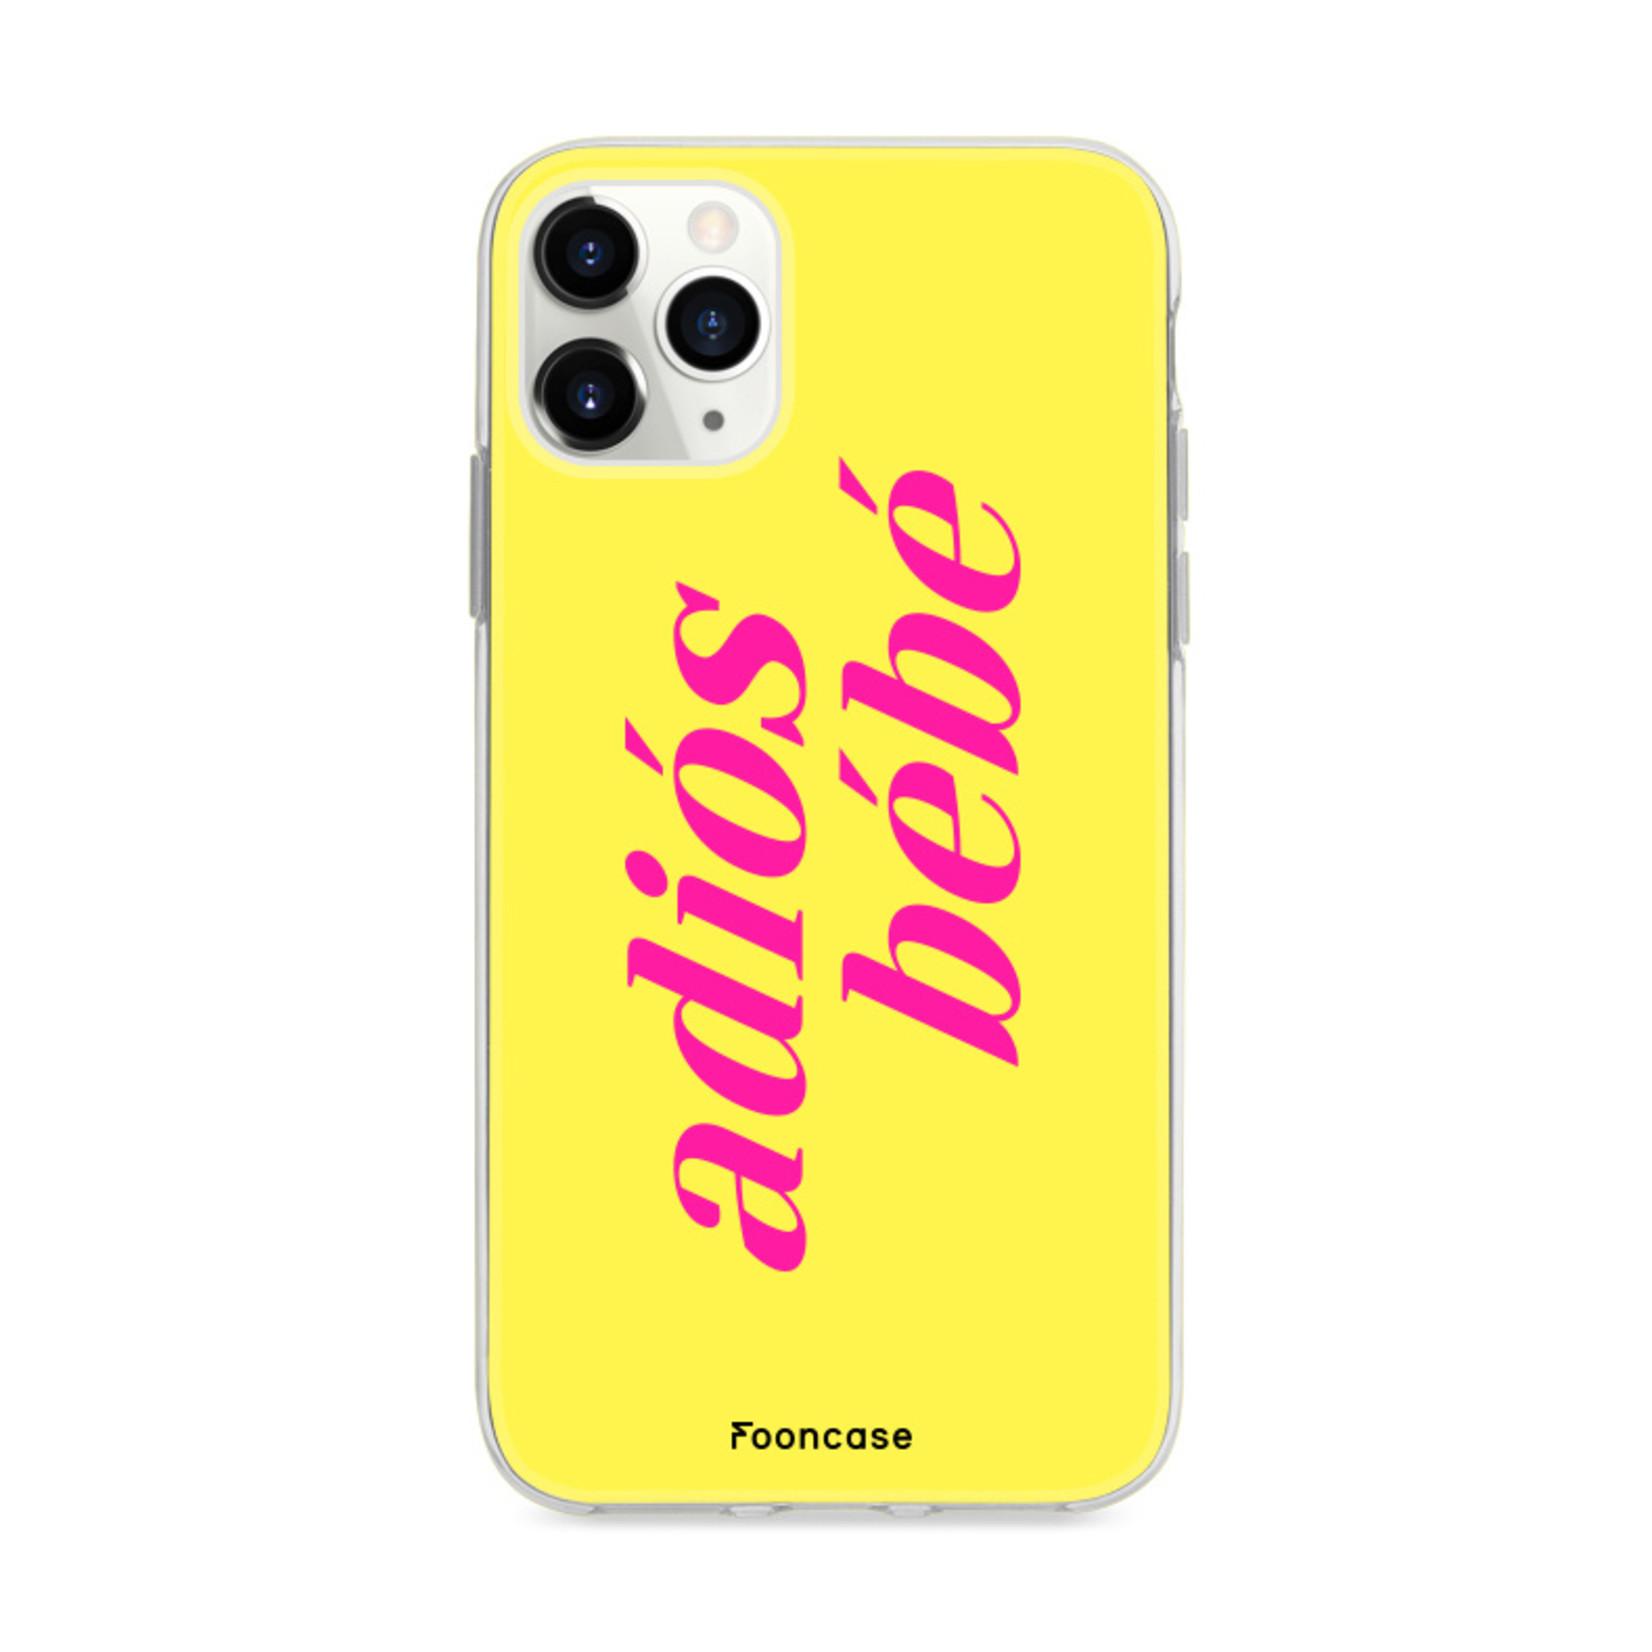 FOONCASE IPhone 12 Pro Max Case - Adiós Bébé ☀